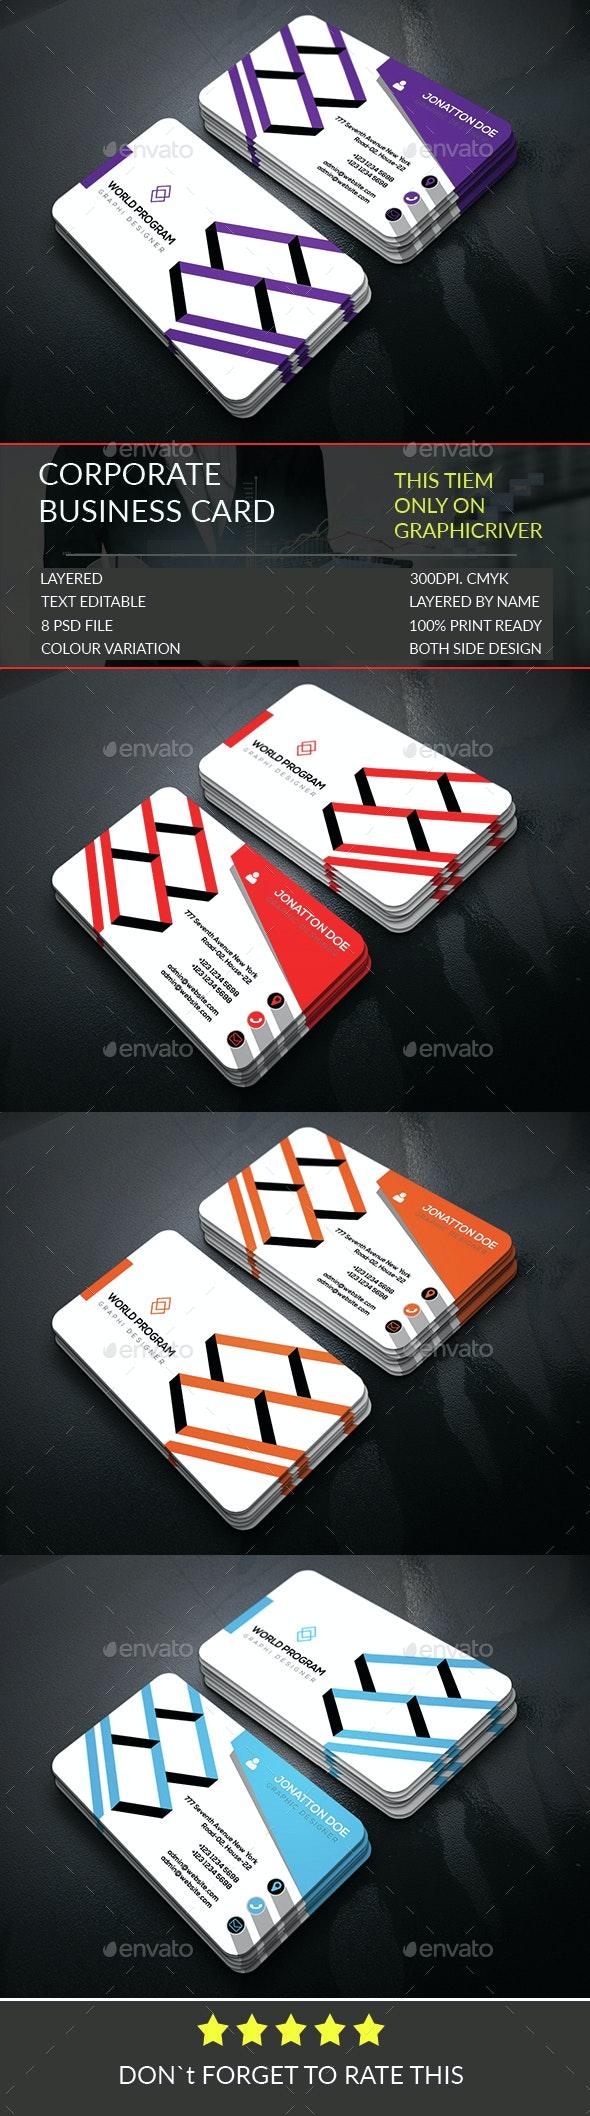 Corporate Business Card Template.304 - Corporate Business Cards